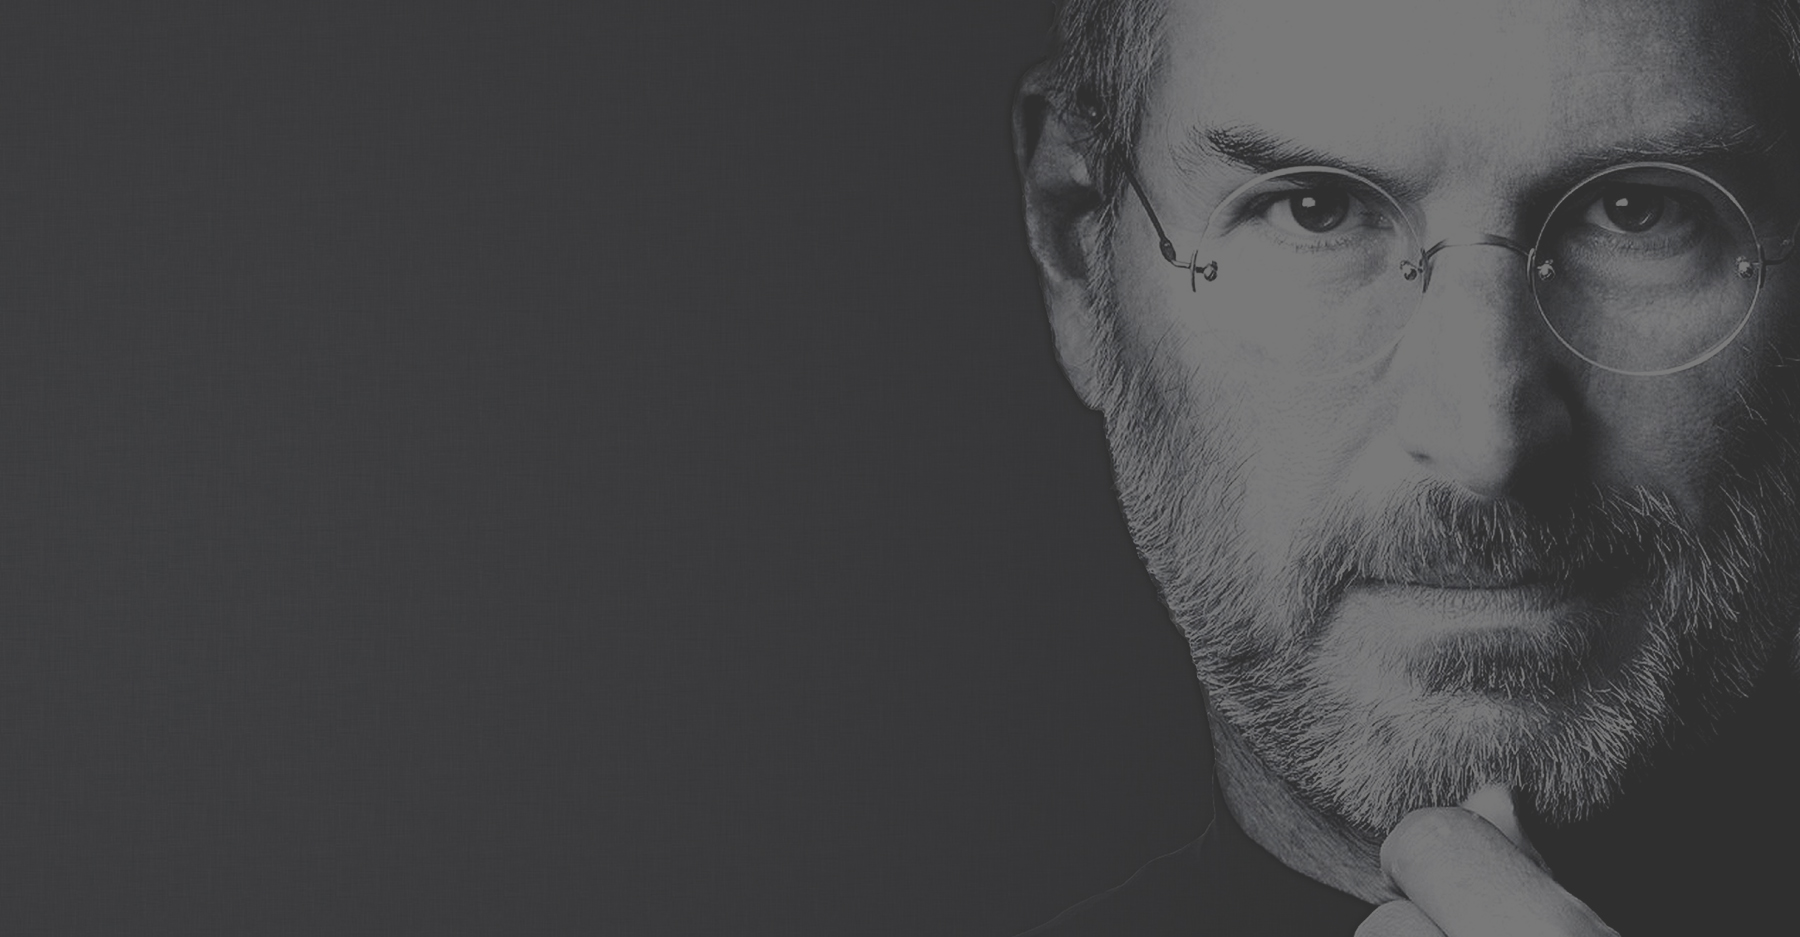 Visage Steve Jobs